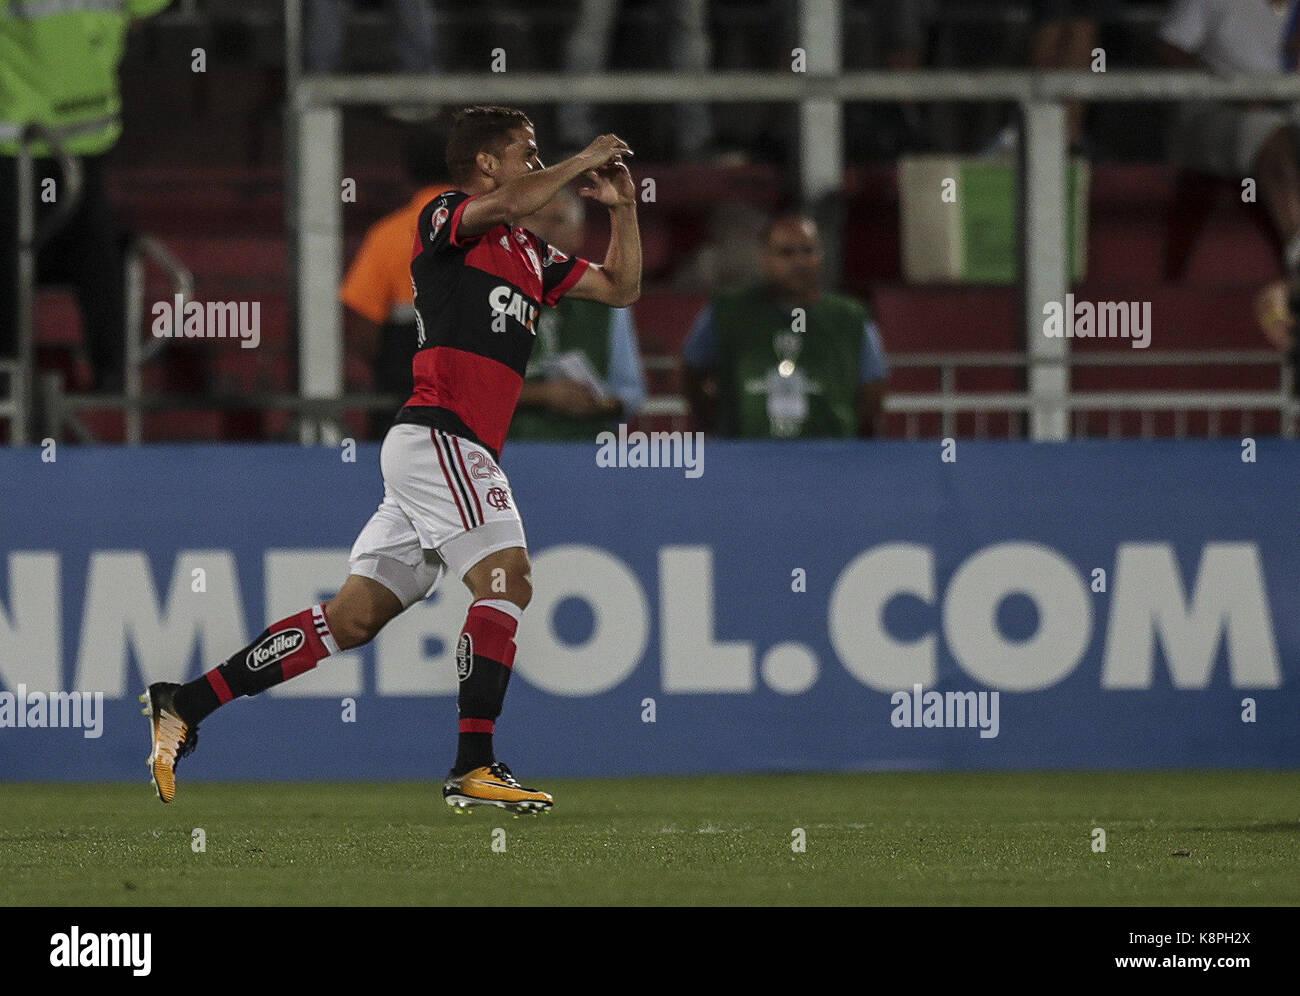 Flamengo's Gustavo Cuellar jubilates a goal during a Copa Sudamericana match between Flamengo and Chapecoense - Stock Image